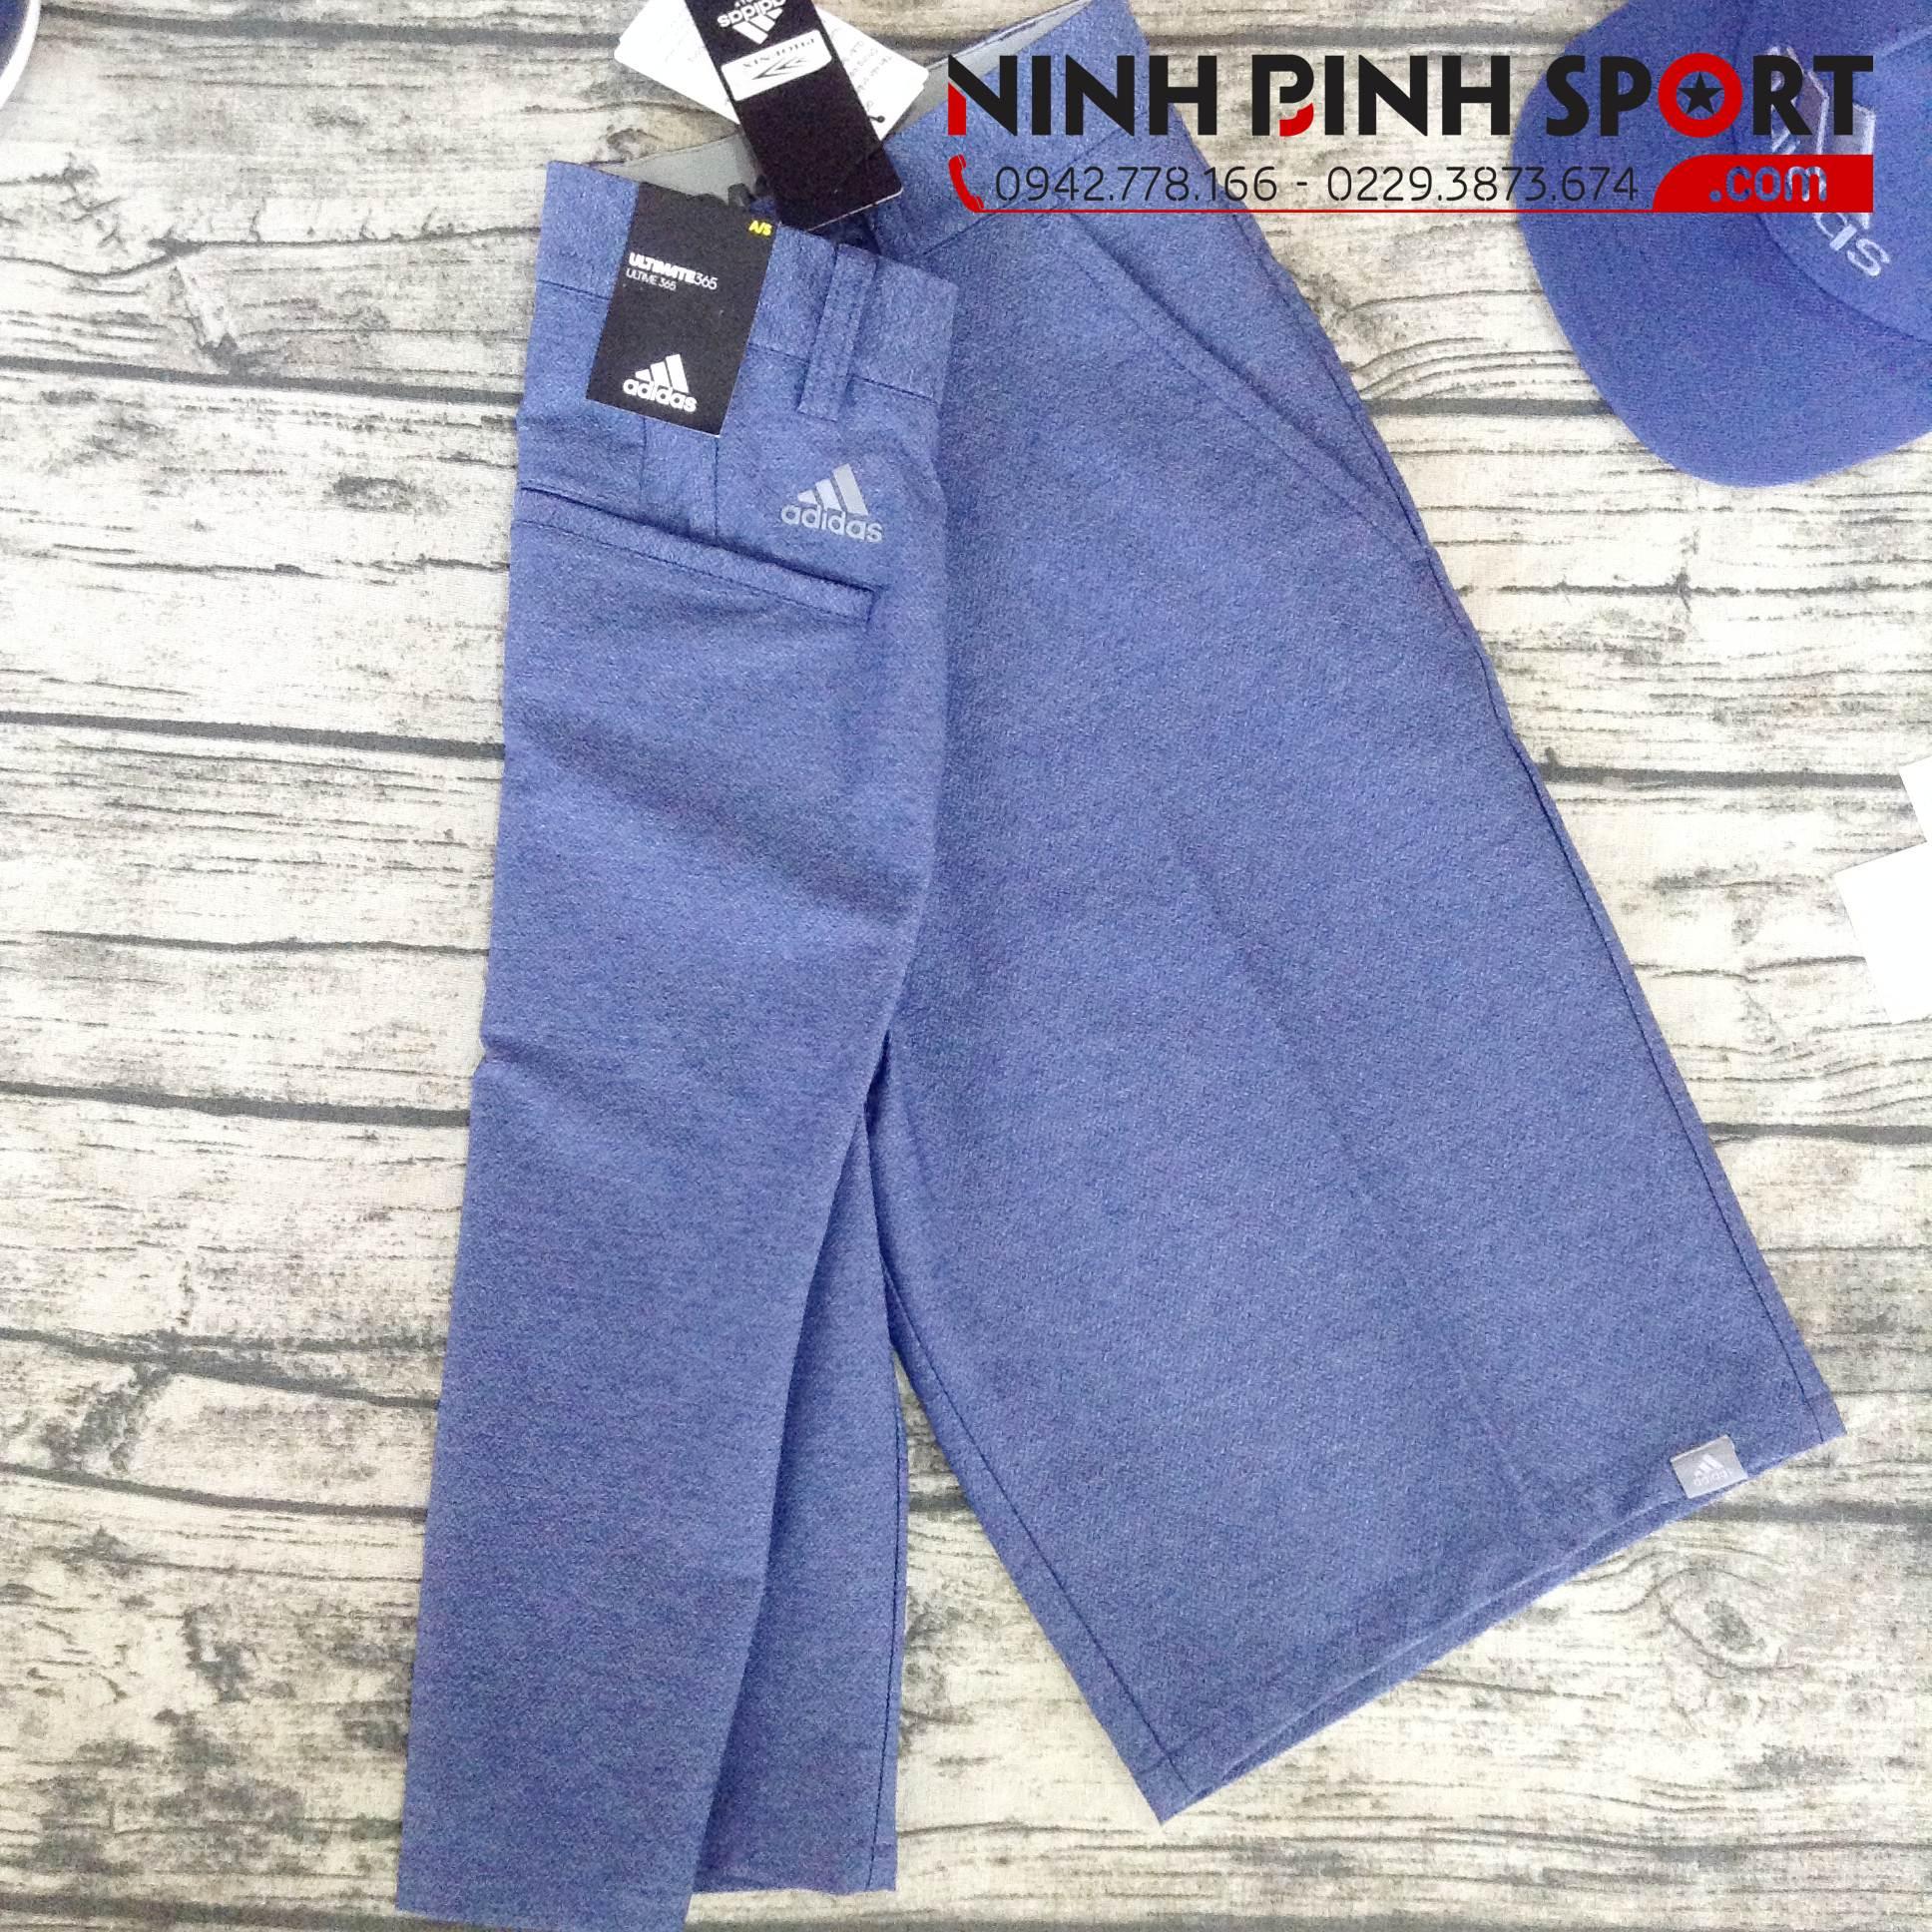 Quần Thể Thao Adidas Golf Ultimate 365 Crosshatch Short - Blue CE0476